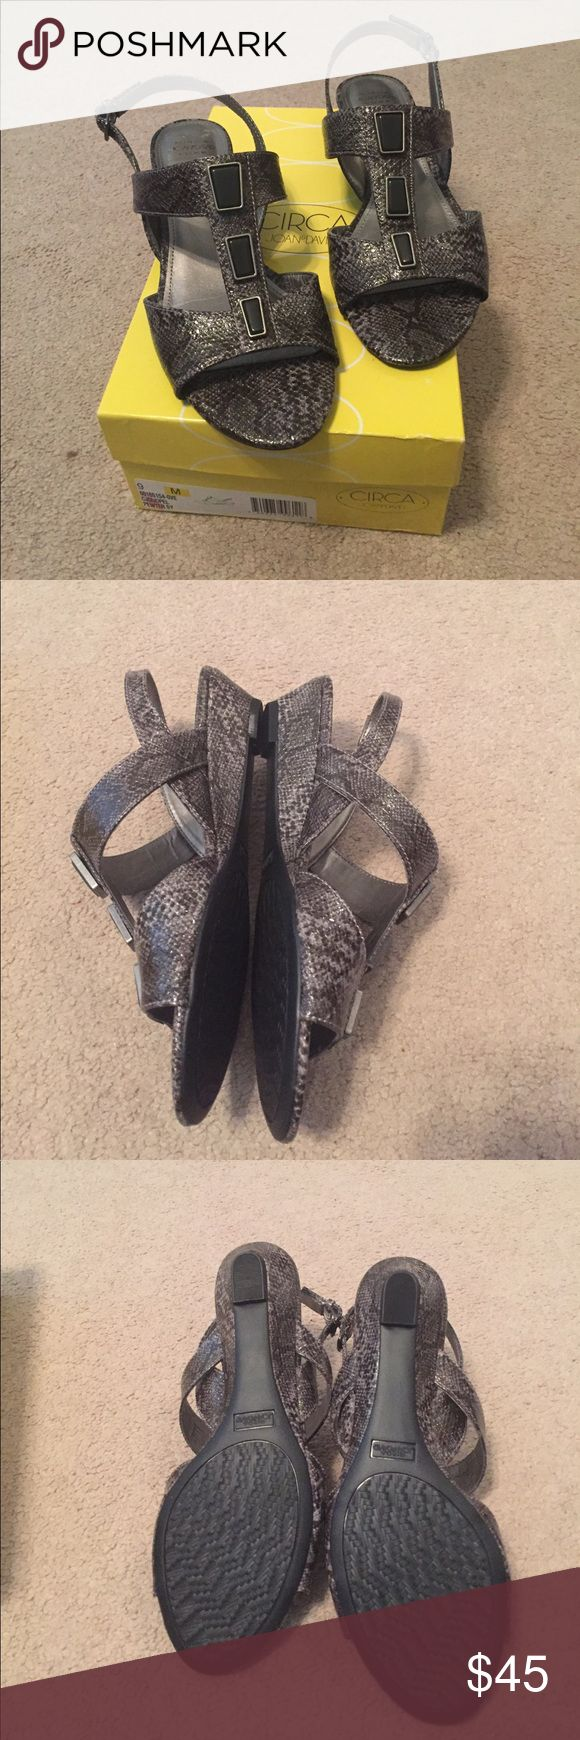 SALE New Joan & David Pewter Sandals New Joan & David pewter snake sandals.   Comfortable Wedge heel.  Size 9. Joan & David Shoes Sandals